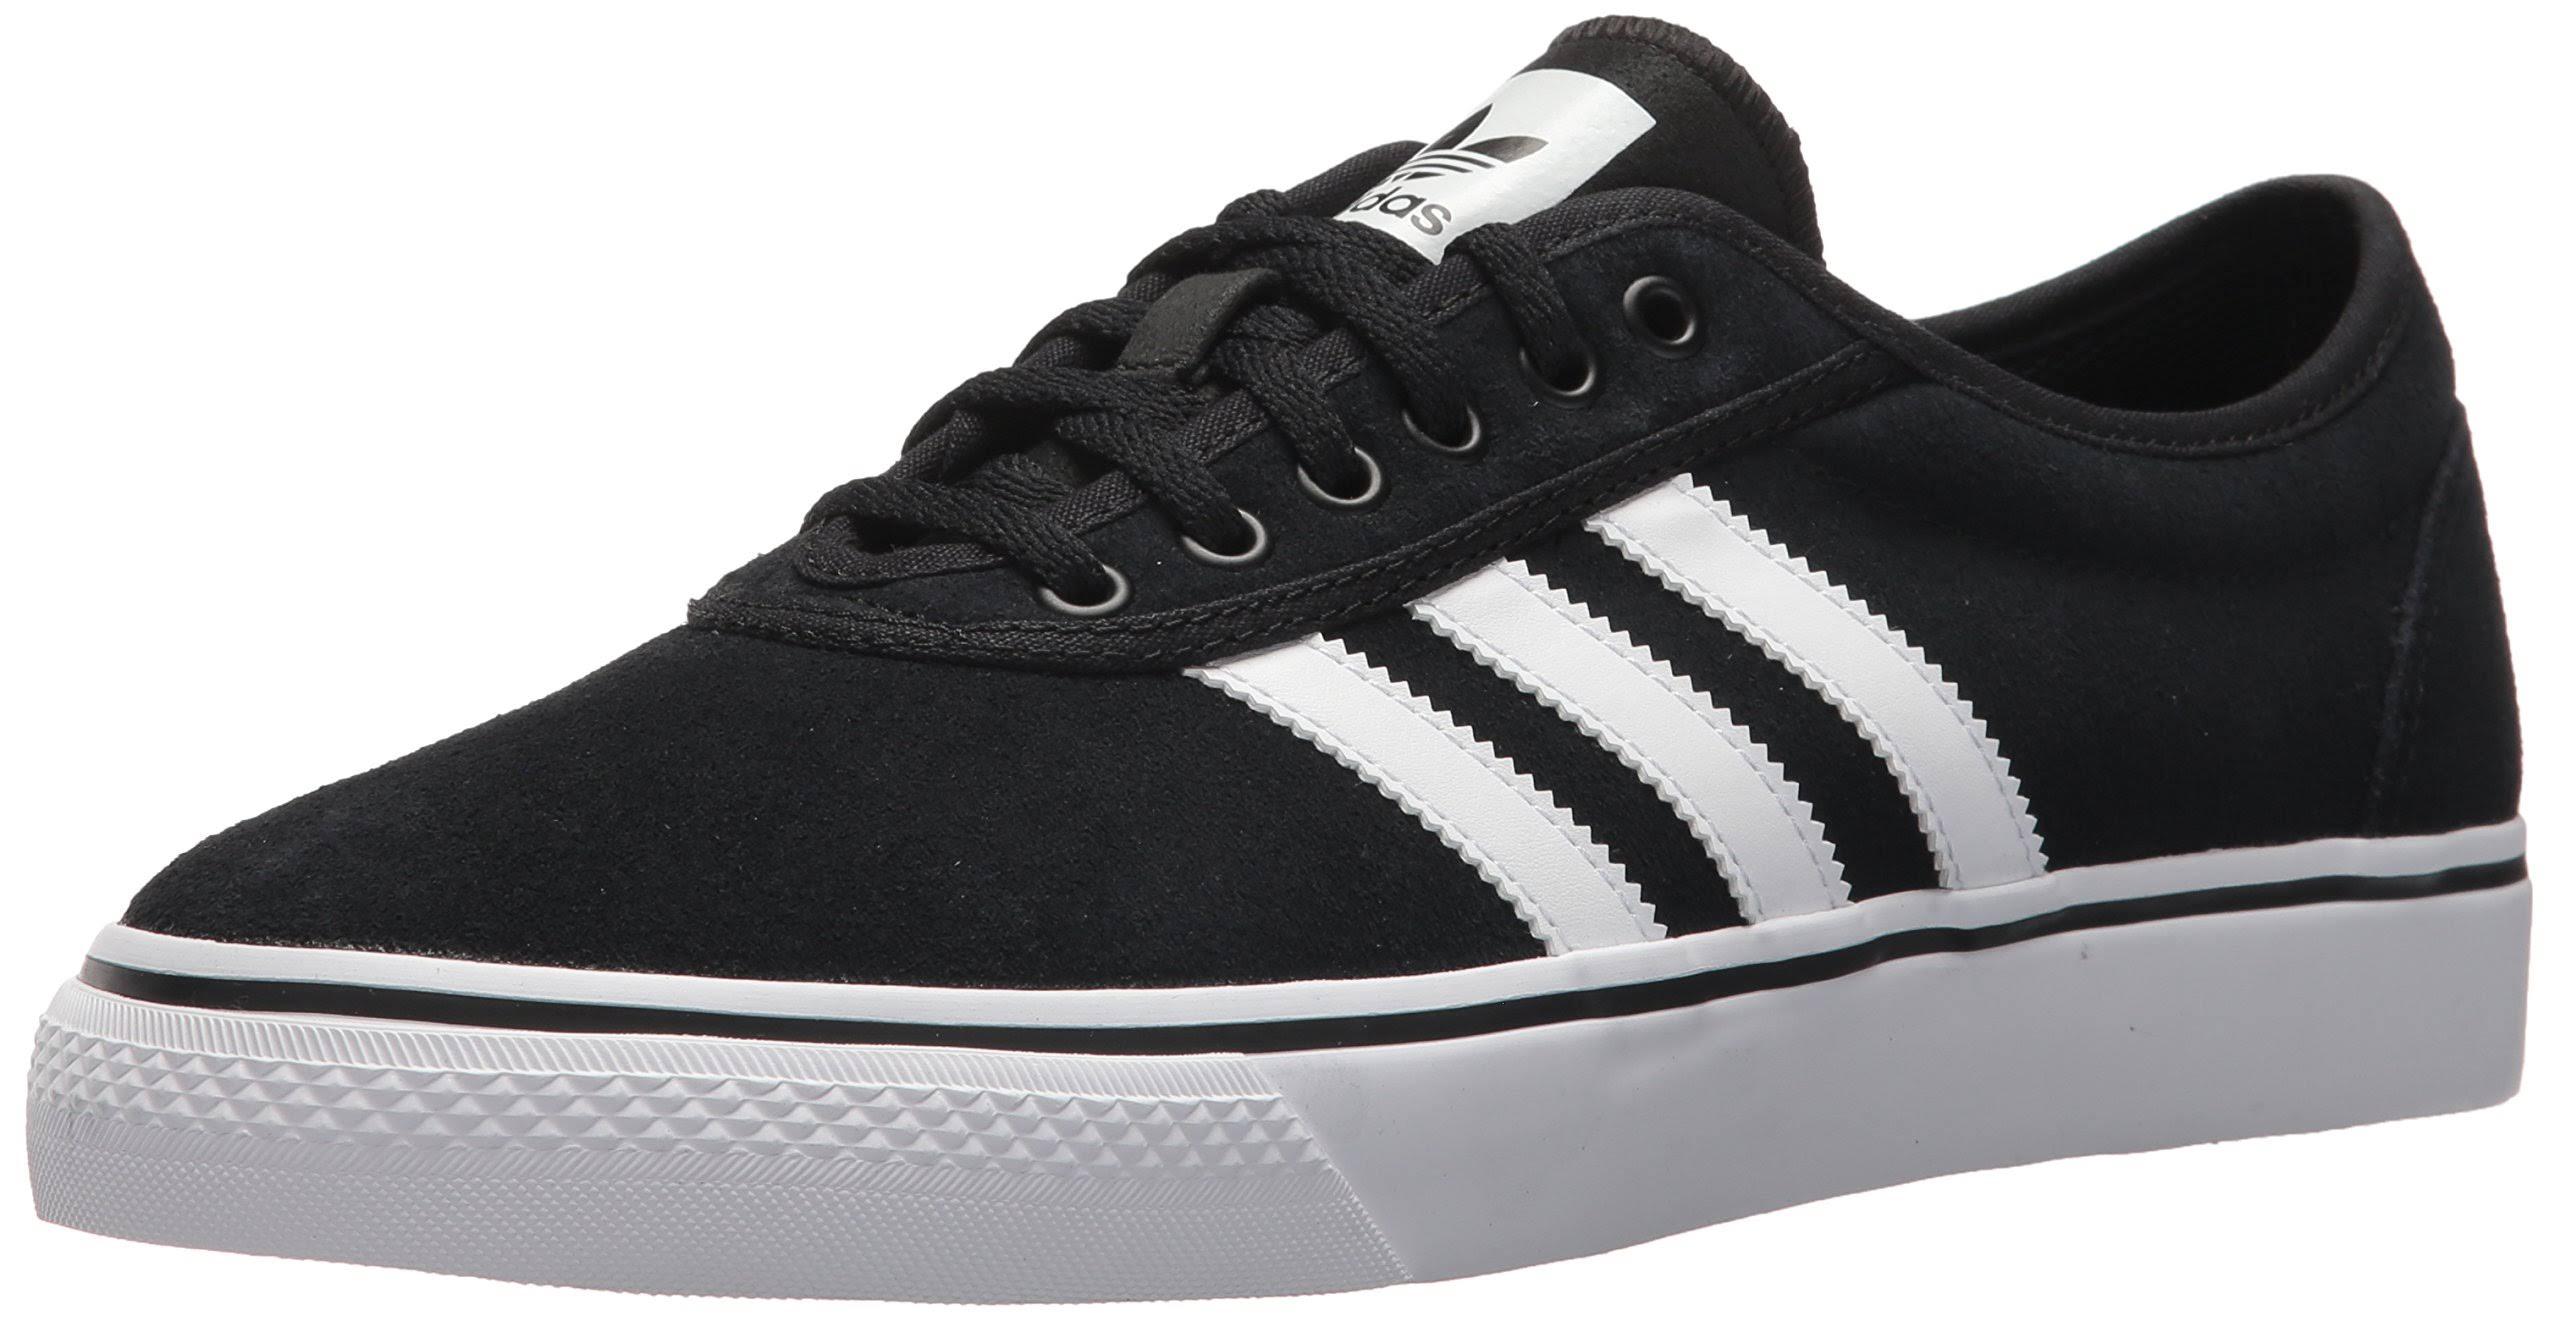 Adidas Adi ease Men's Skate Shoe nUpzq8